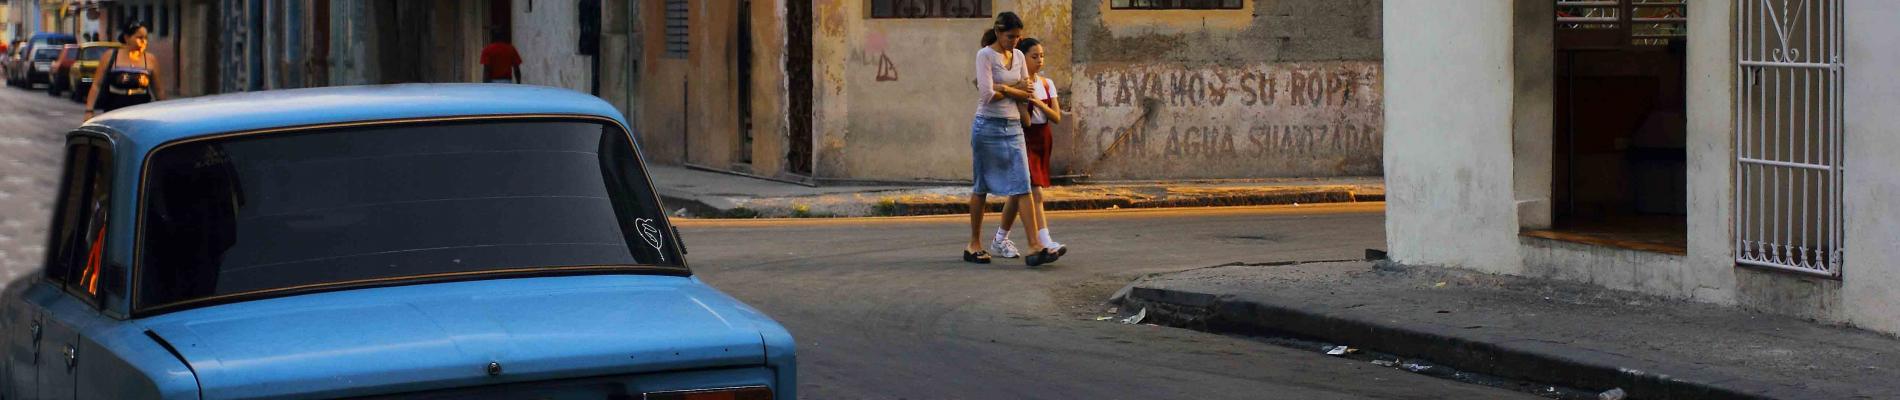 Bruno (CC BY-SA 2.0)